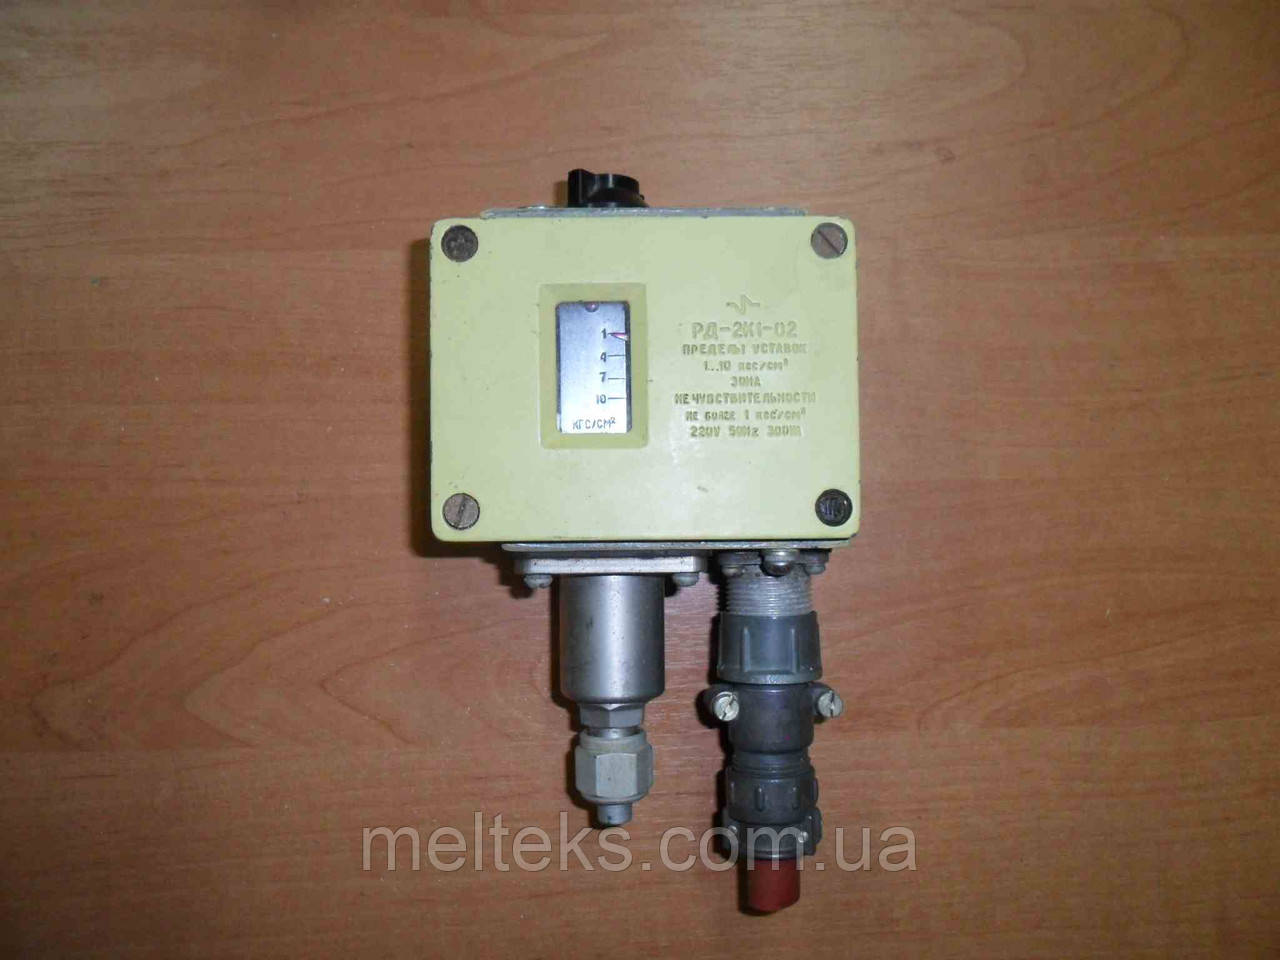 Реле давления РД-1К1-01, РД-2К1-02, РД-2К1-03, РД-2К-03